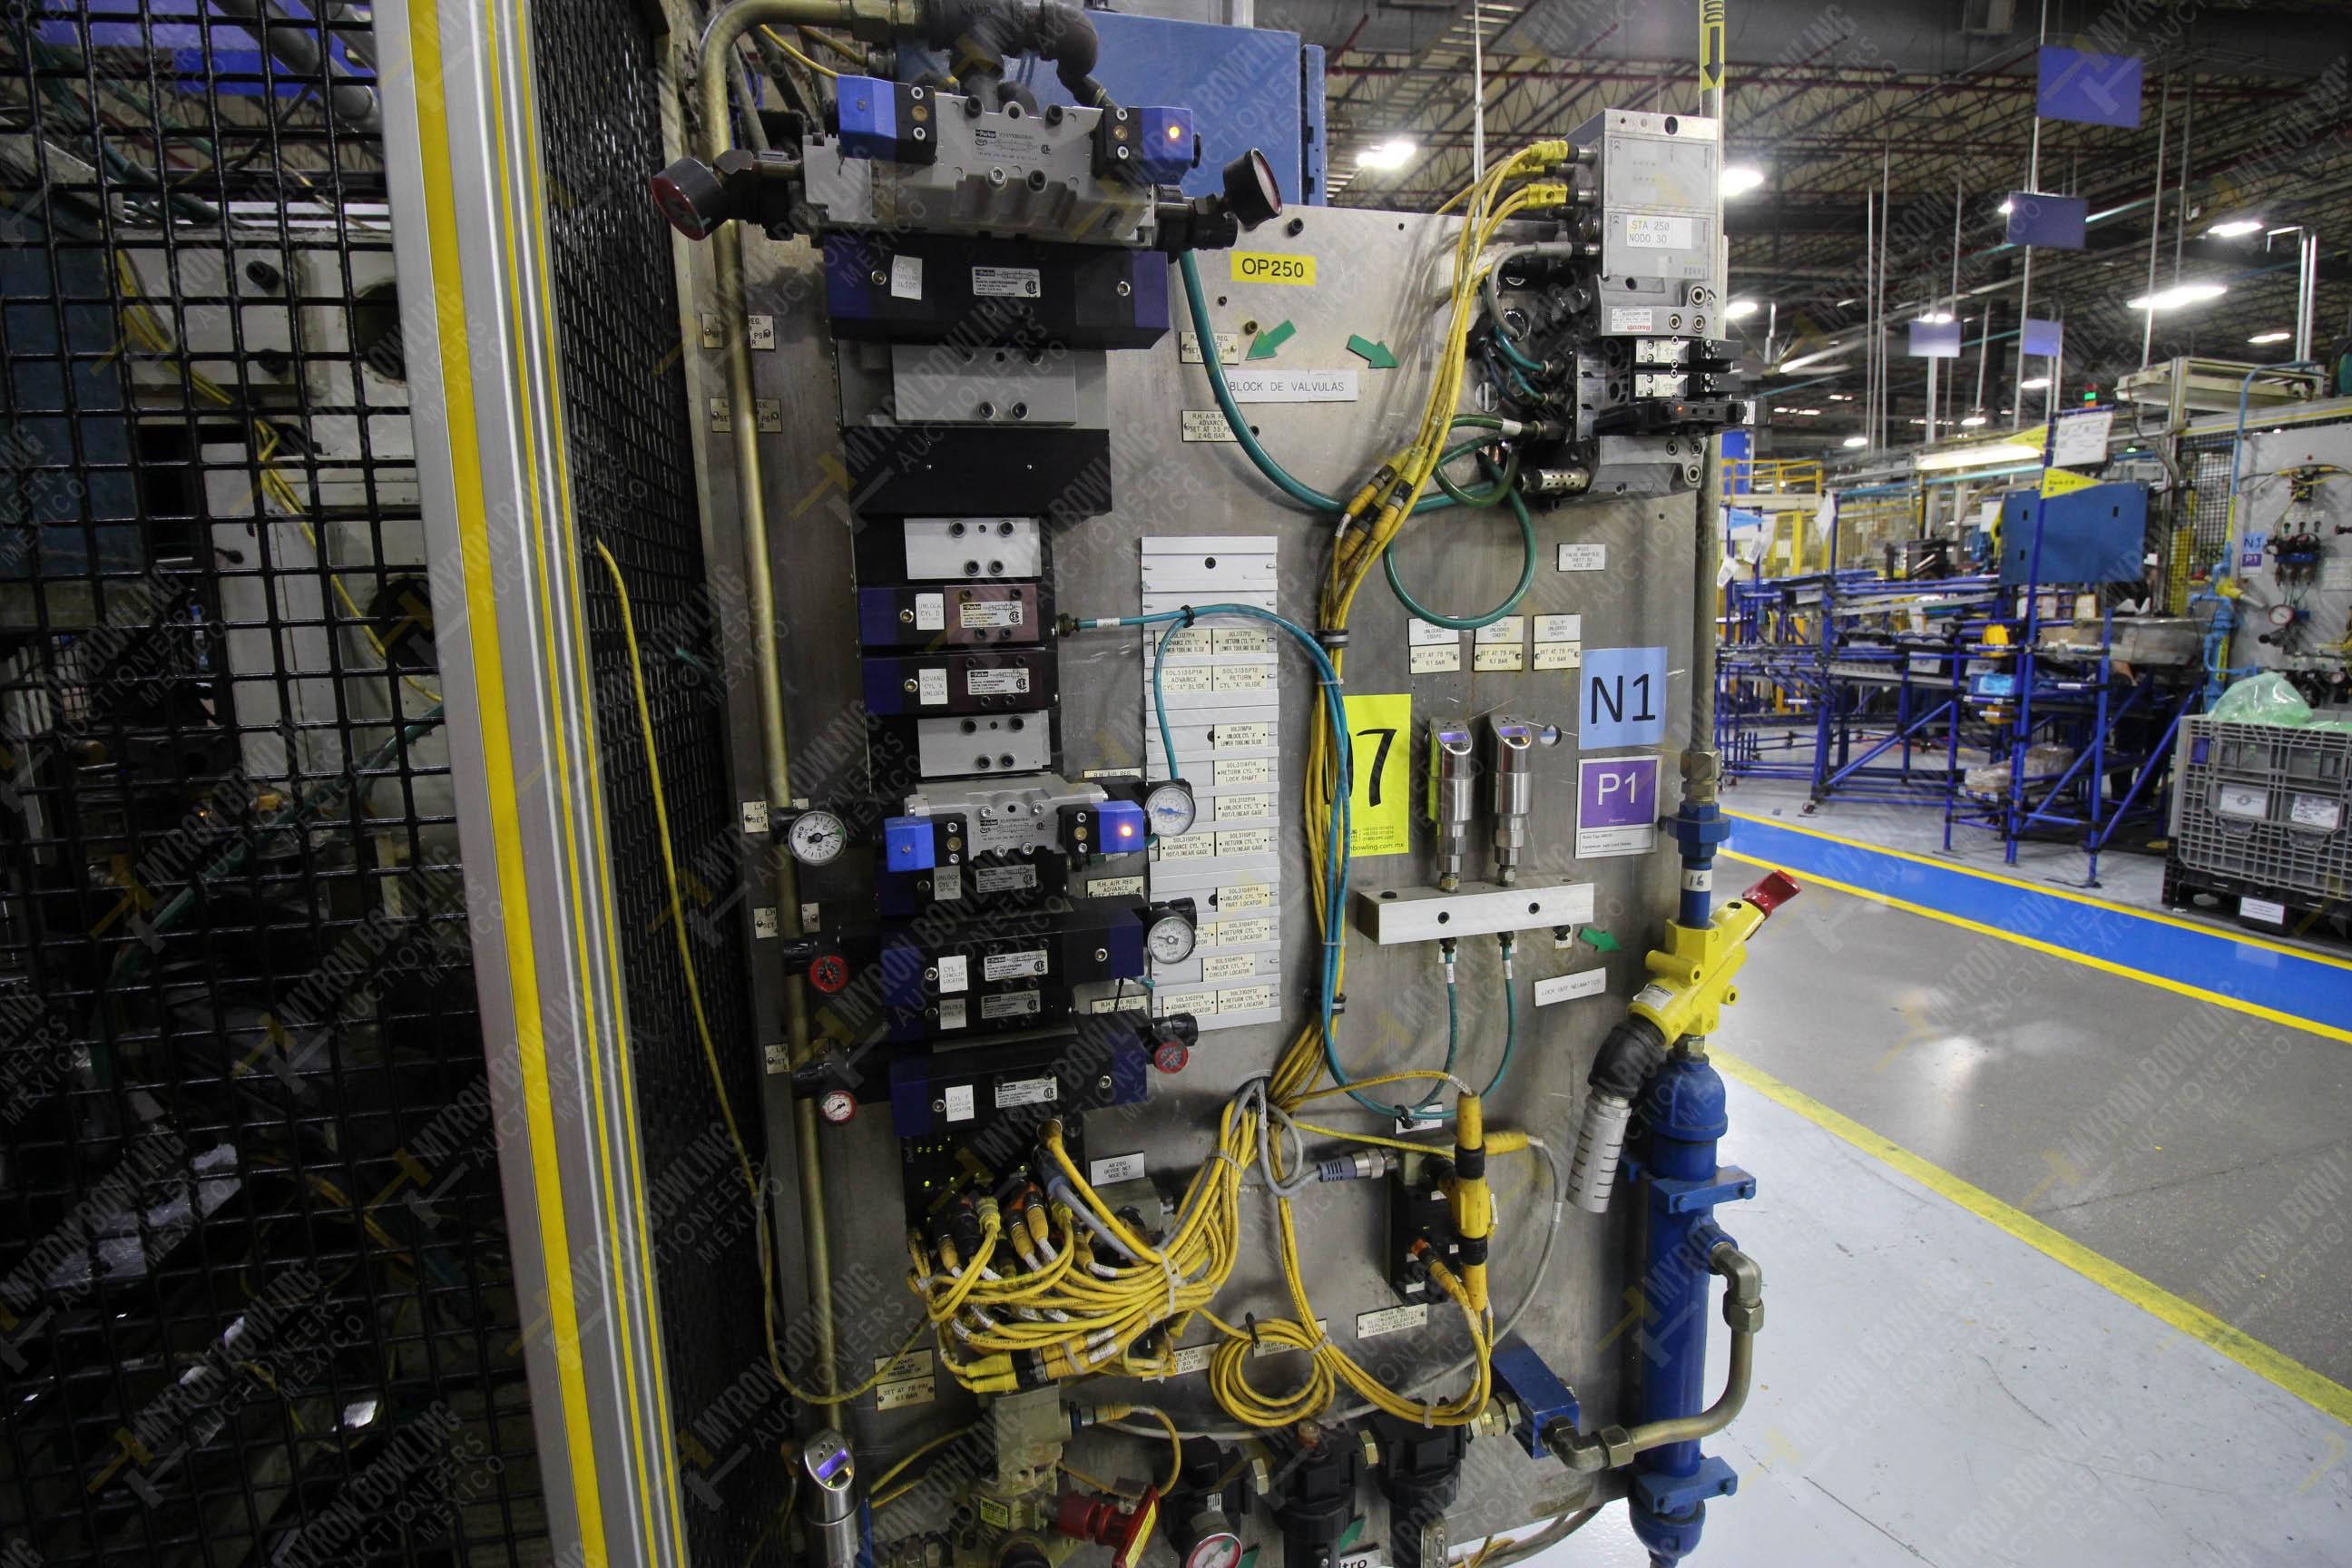 Estación semiautomática para operación 250 de ensamble de candado, contiene - Image 13 of 21